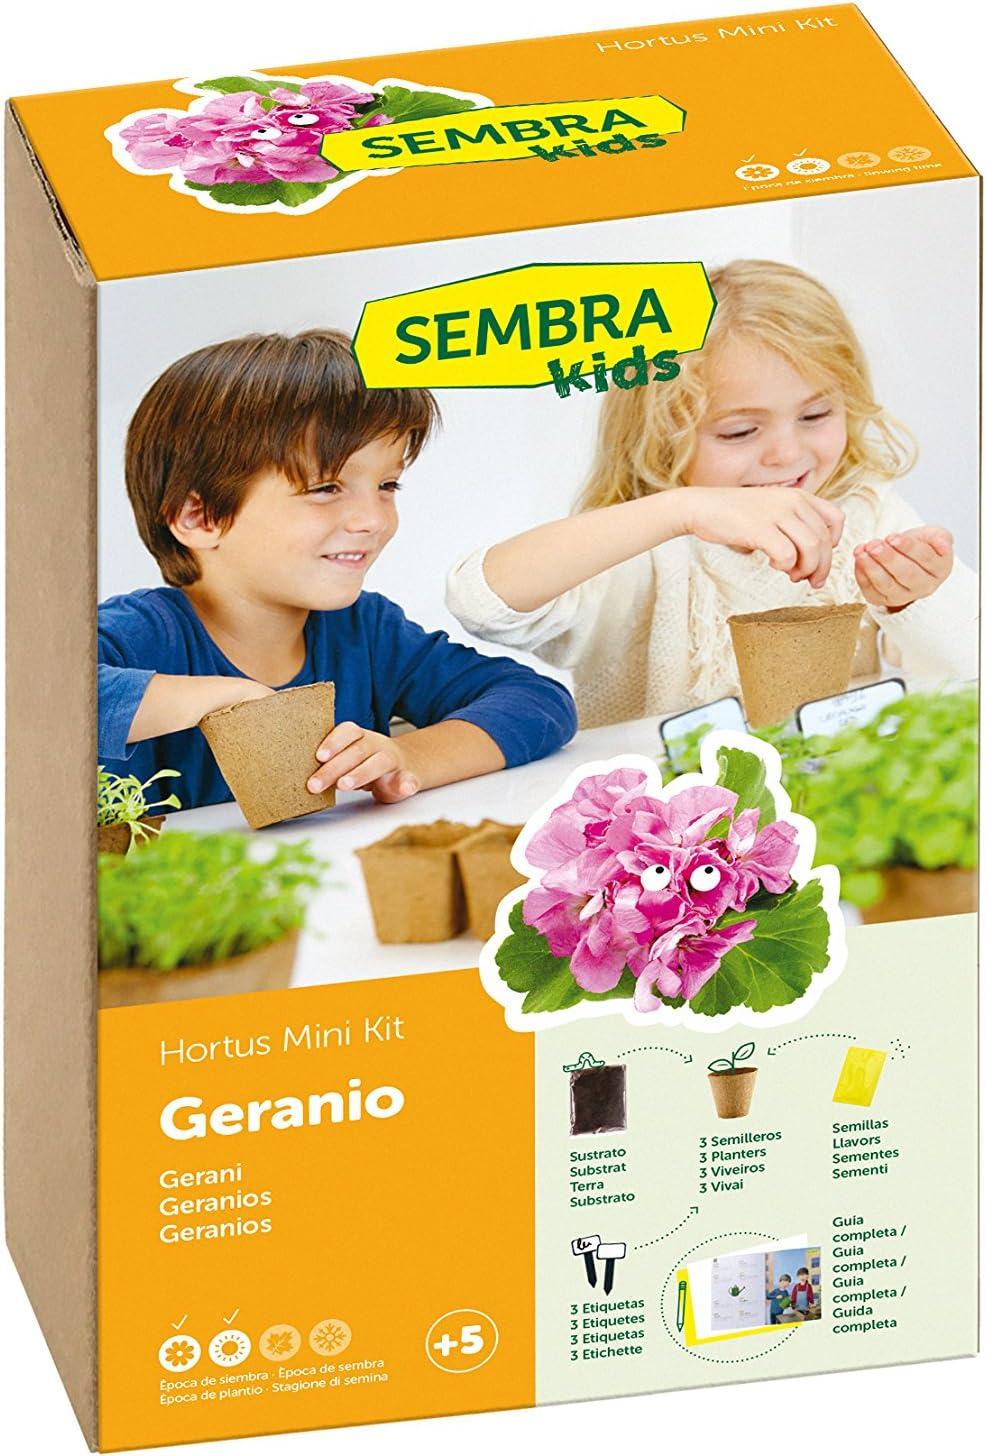 SEMBRA - juego educativo, Kit huerto Geranio